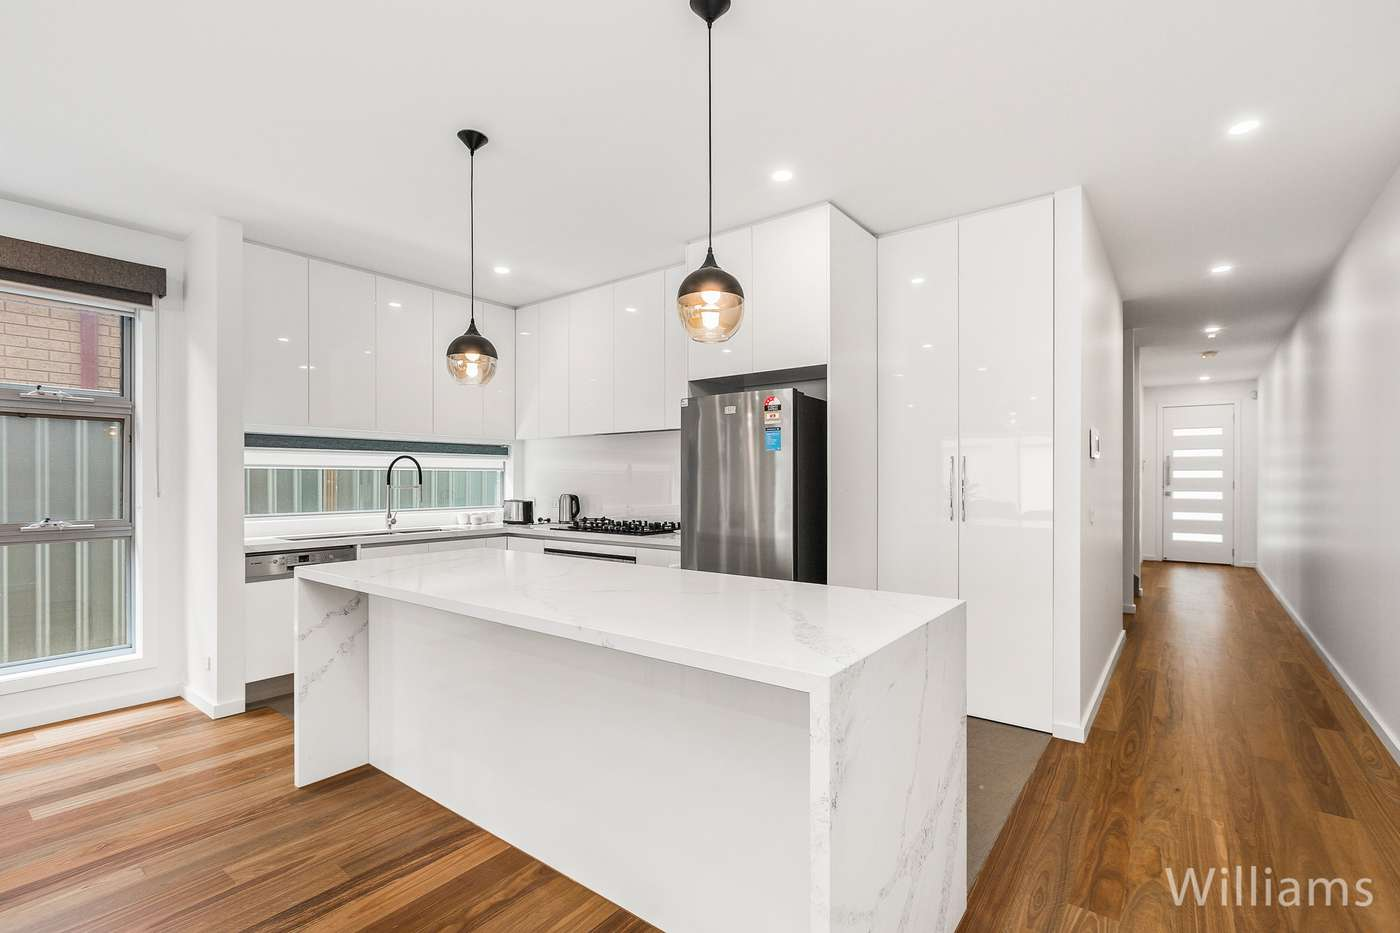 Main view of Homely house listing, 153A Blackshaws Road, Newport, VIC 3015